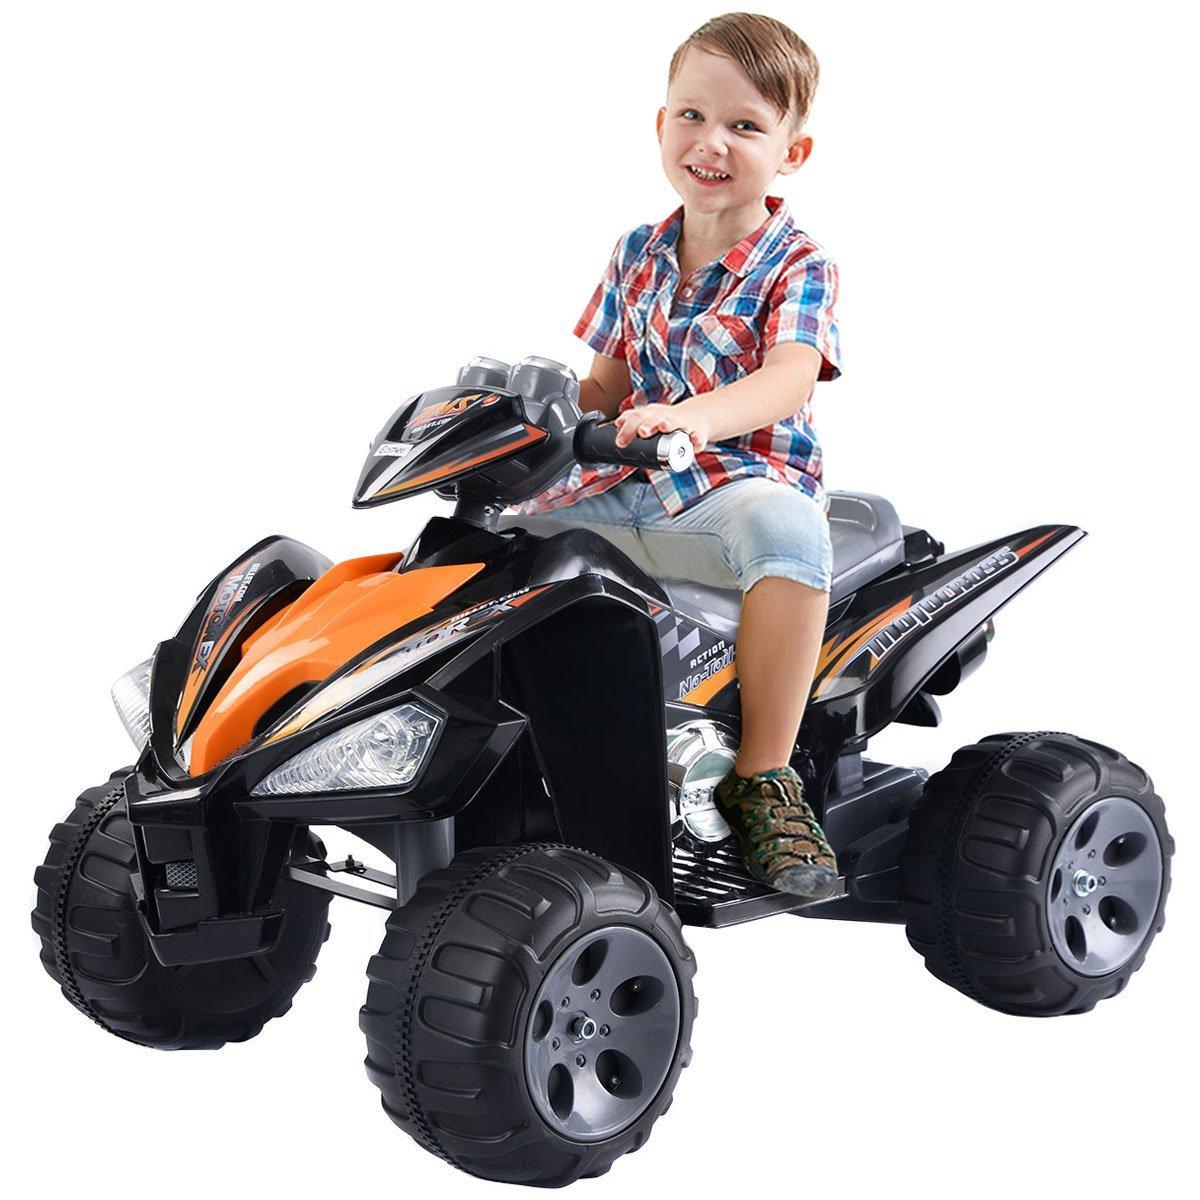 amazoncom giantex kids ride on atv quad 4 wheeler electric toy car 12v battery power black toys games